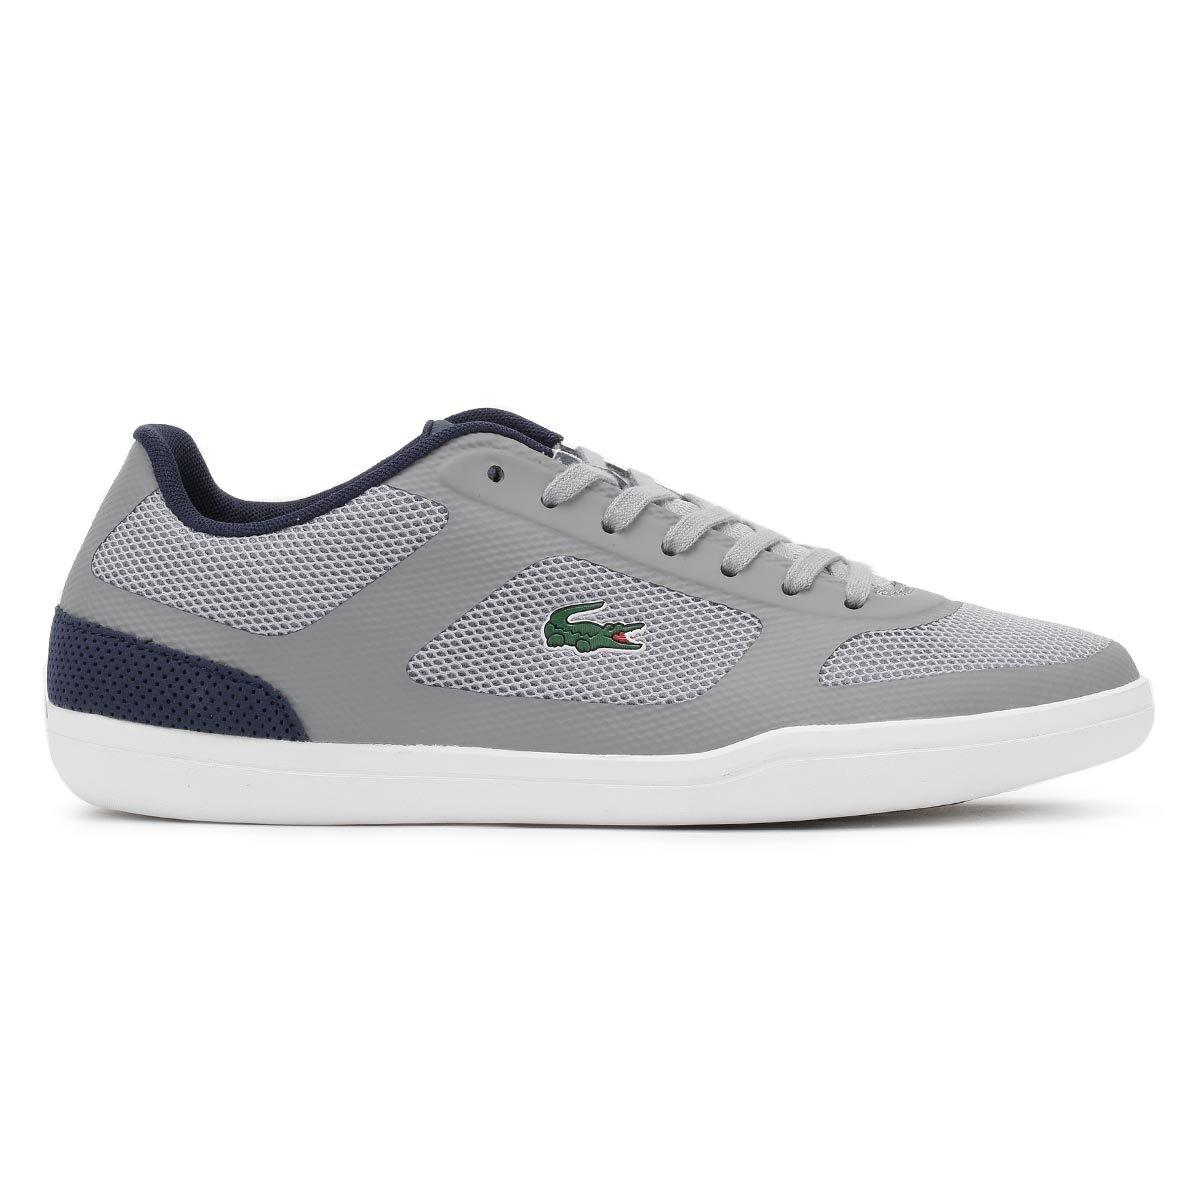 528439268b Lacoste Homme Chaussures / Baskets Court Minimal Sport 117 1: Amazon.fr:  Chaussures et Sacs